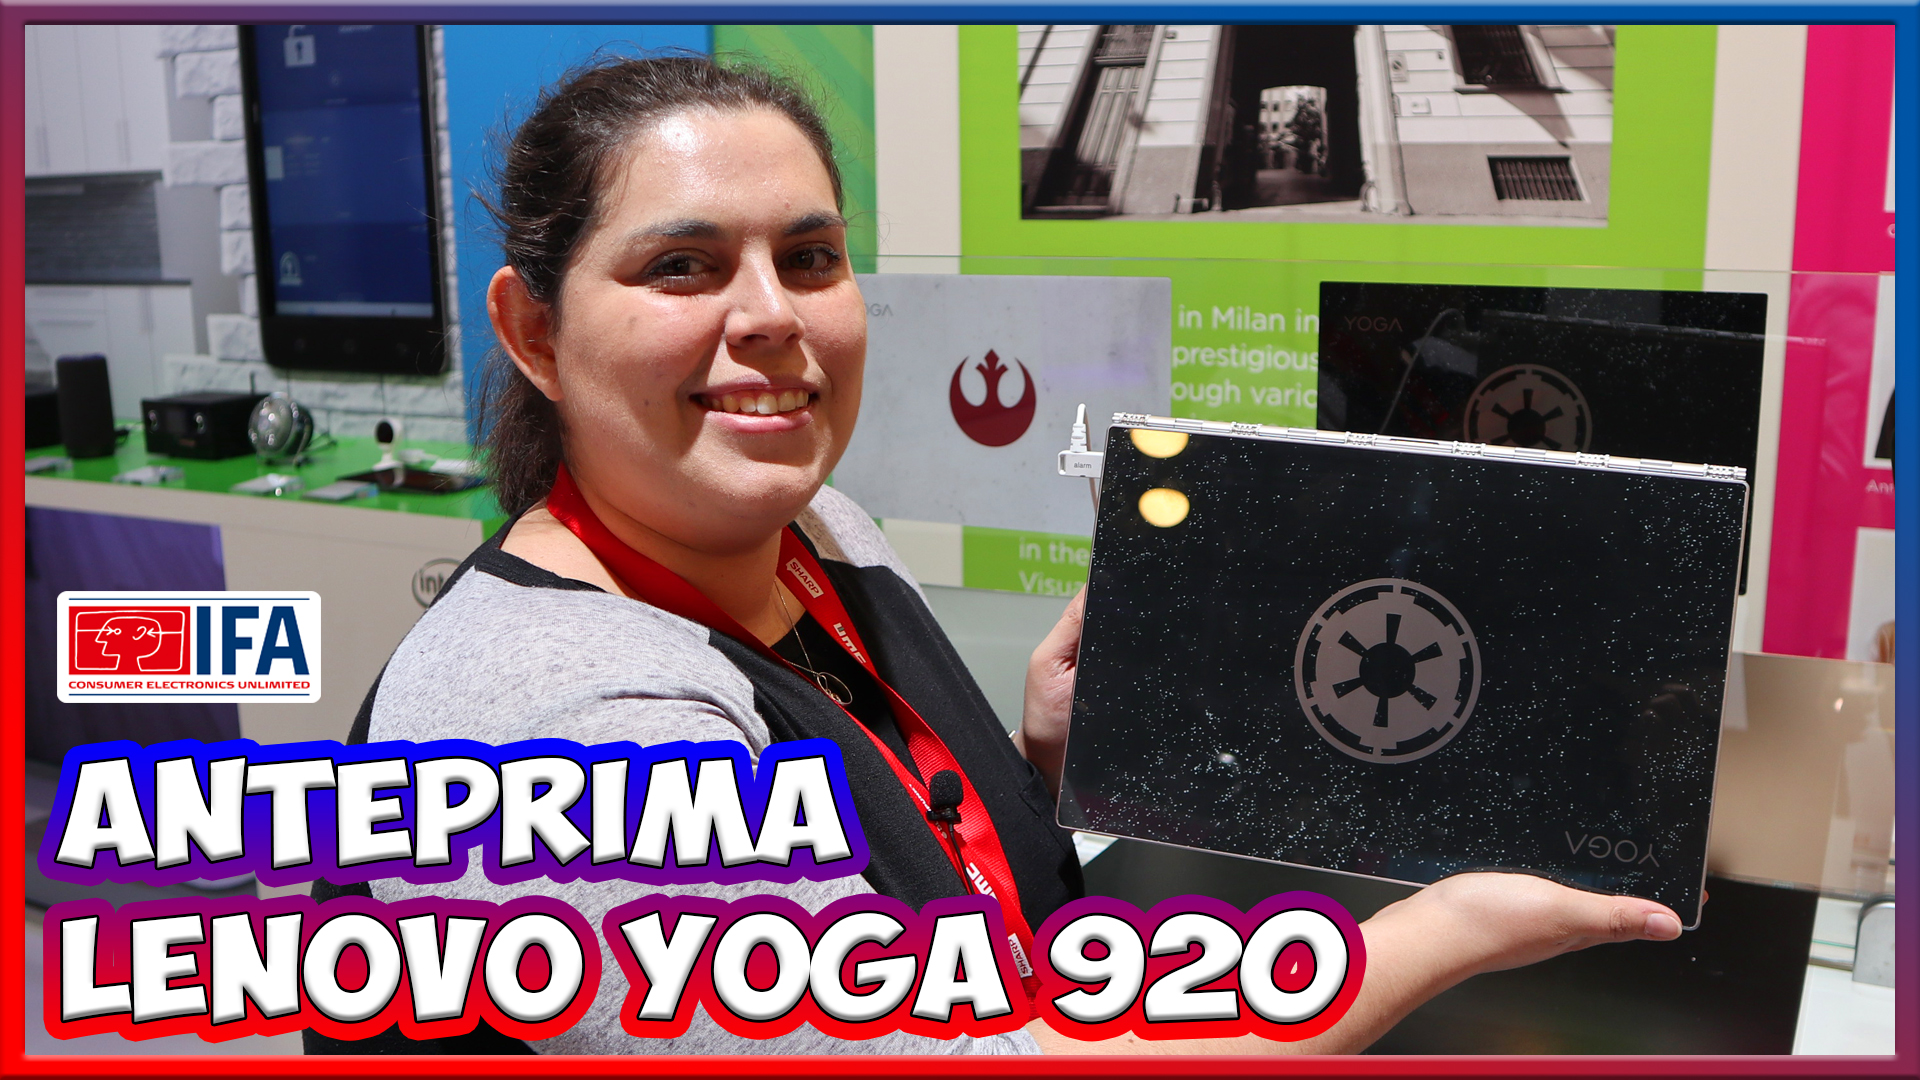 [IFA 2017] Lenovo Yoga 920: la nostra anteprima thumbnail